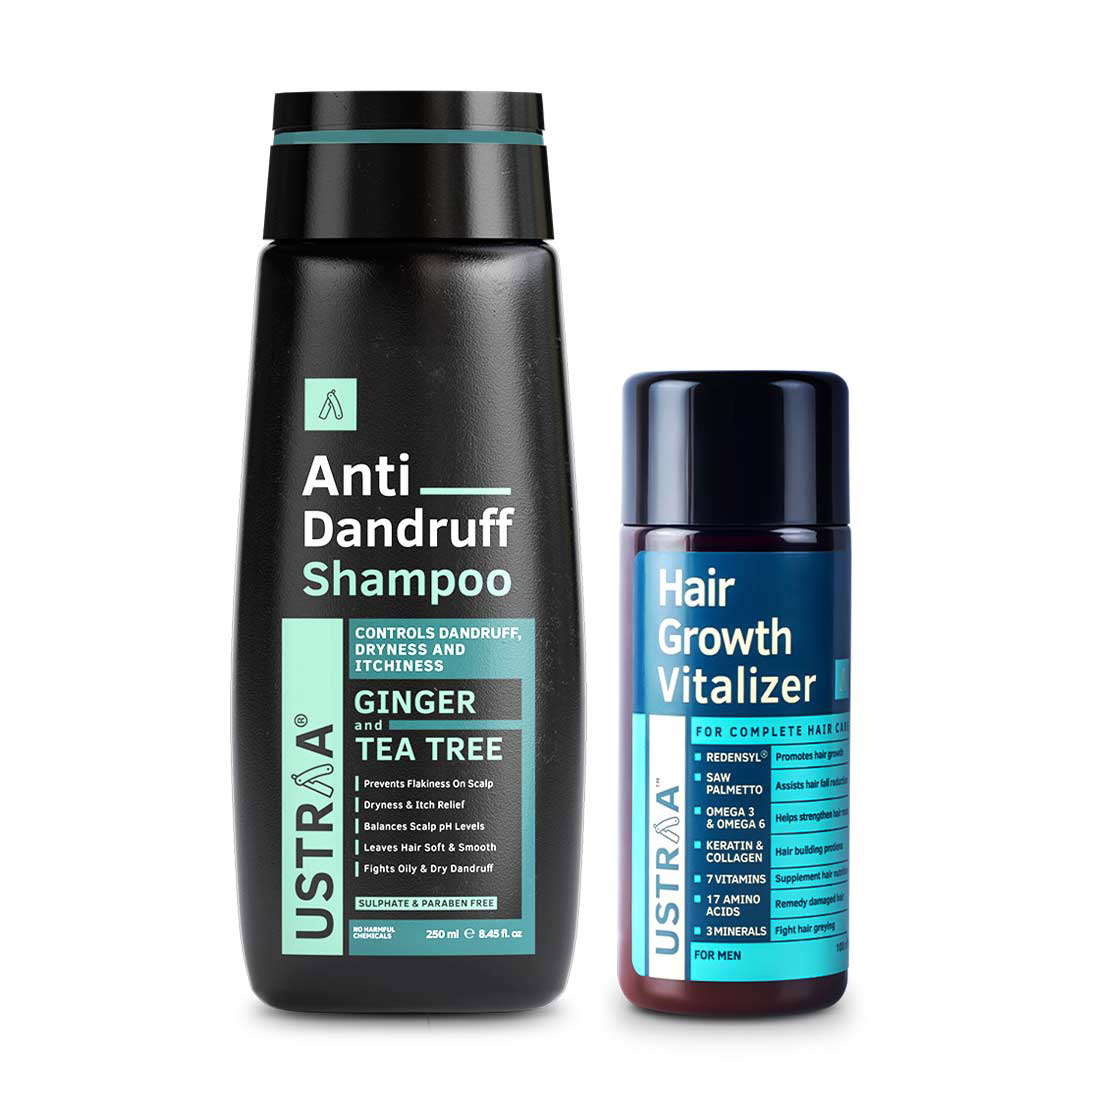 Ustraa | Hair Growth Vitalizer & Anti Dandruff Shampoo(Pack of 2)